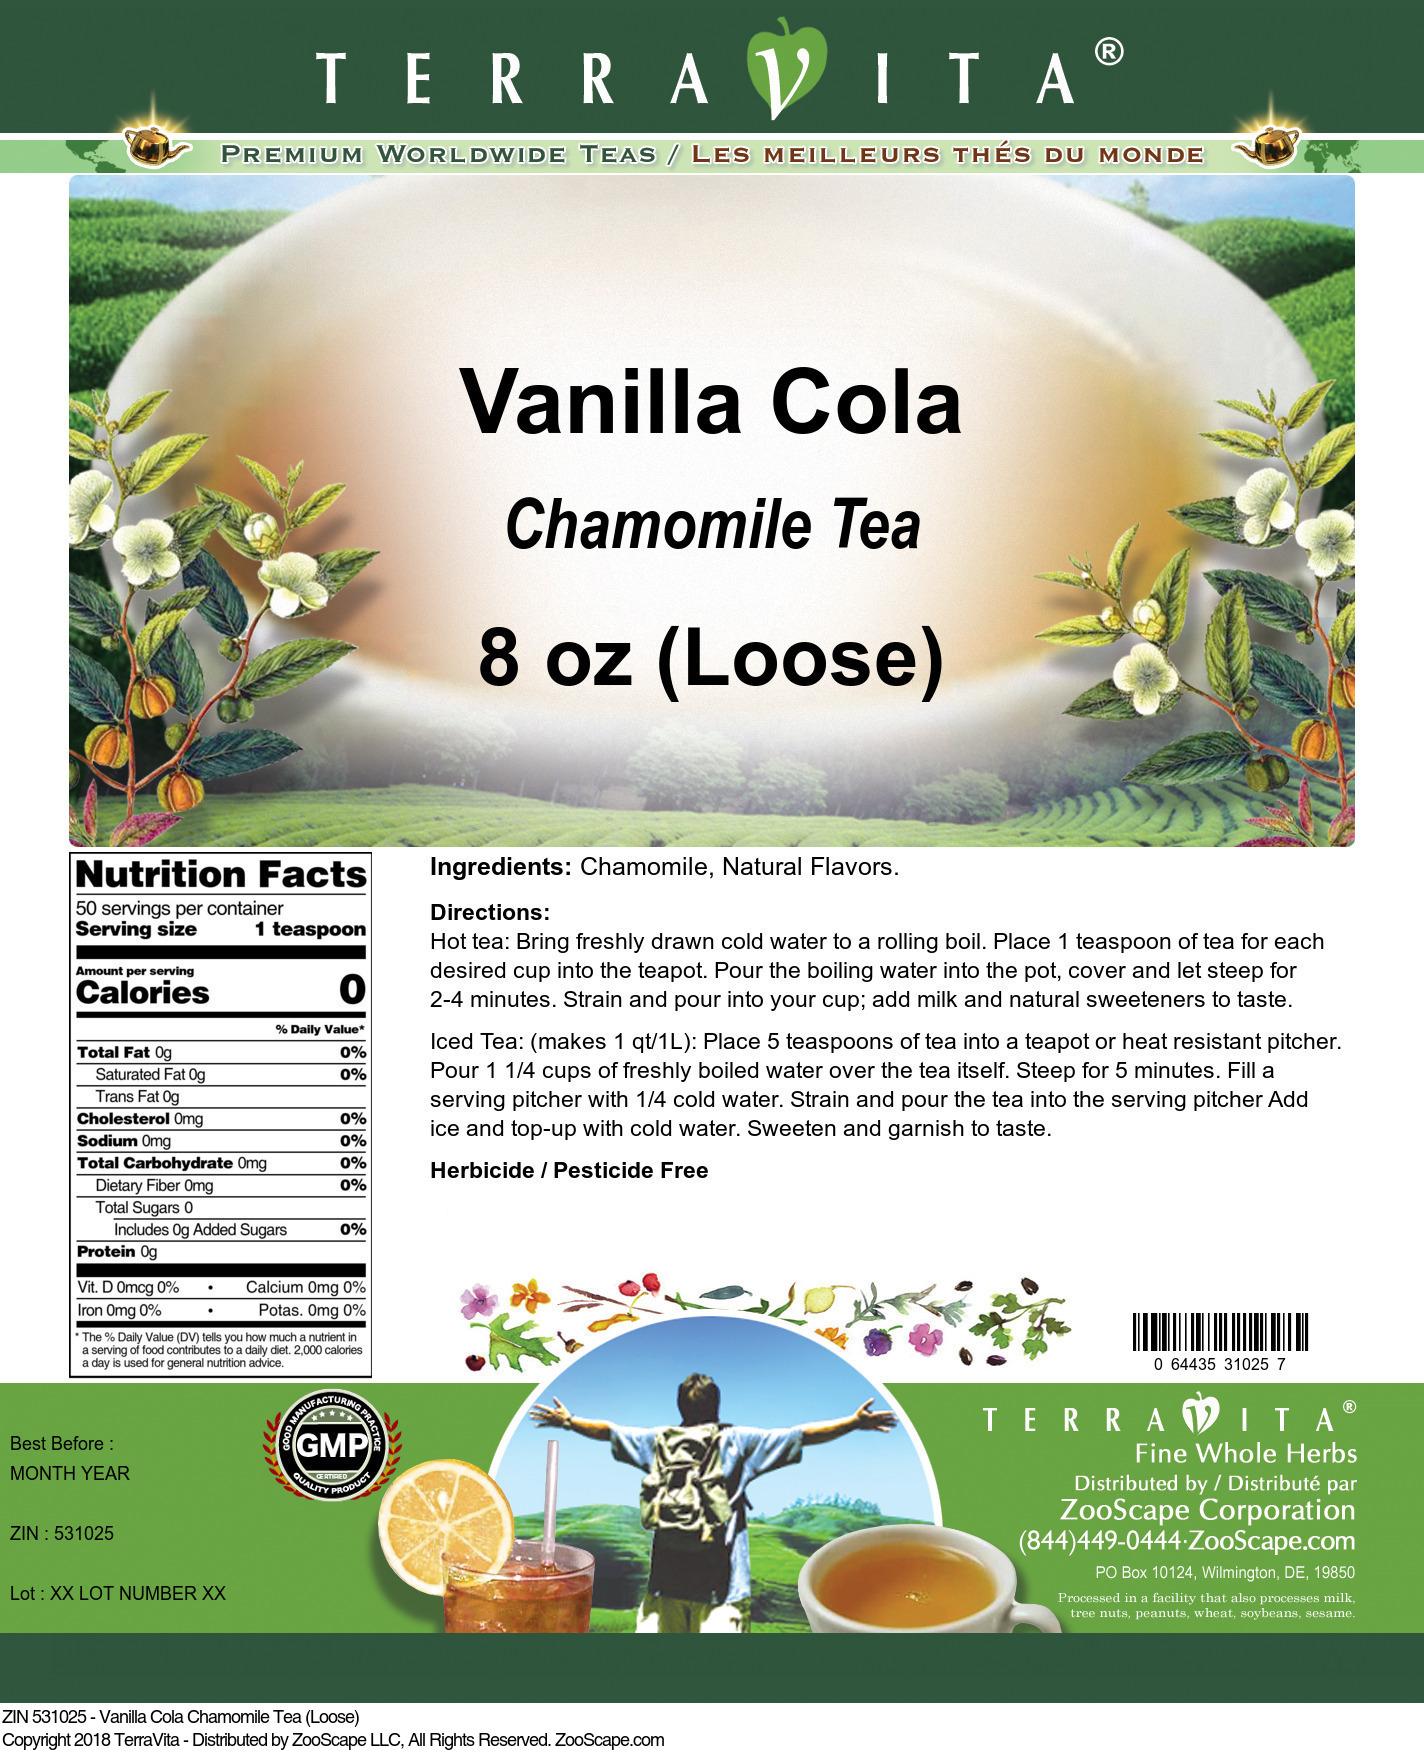 Vanilla Cola Chamomile Tea (Loose)